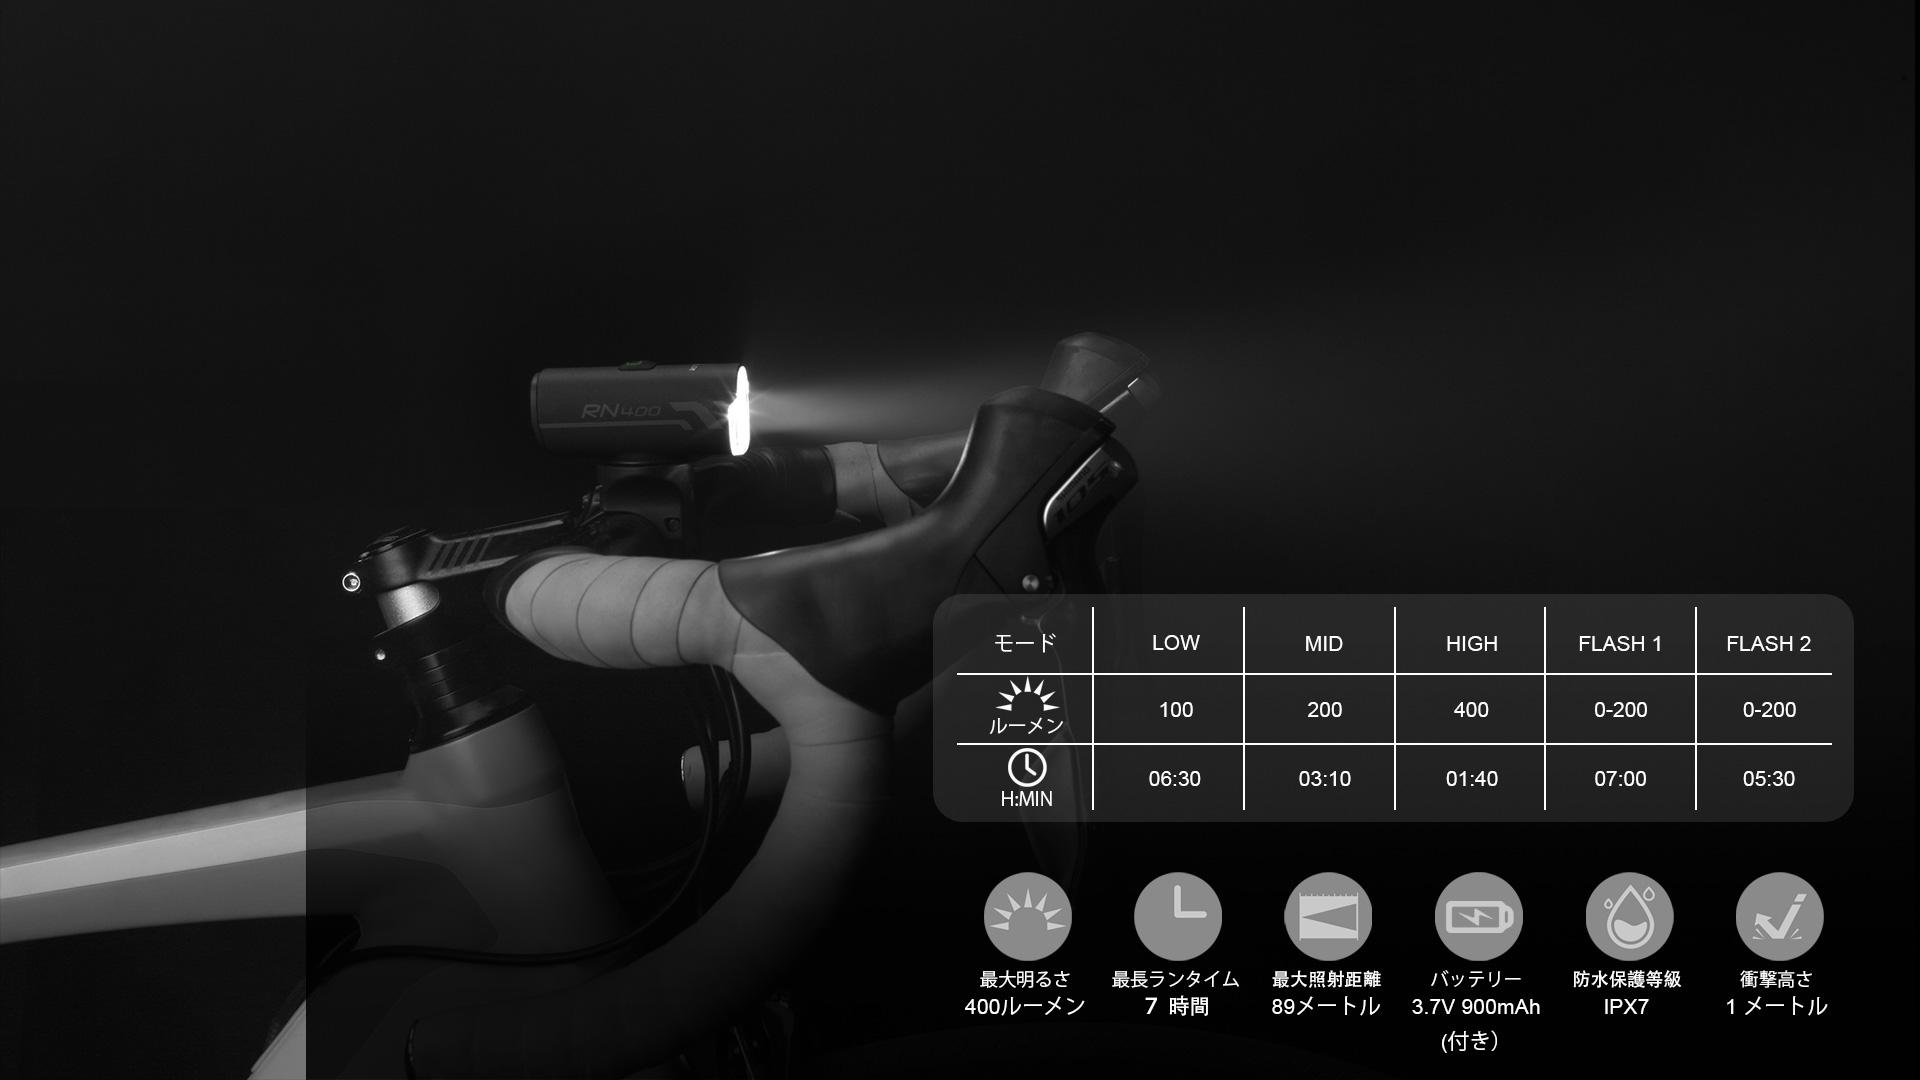 RN400には、低、中、高、点滅1、点滅2の5つのライトモードがあります。